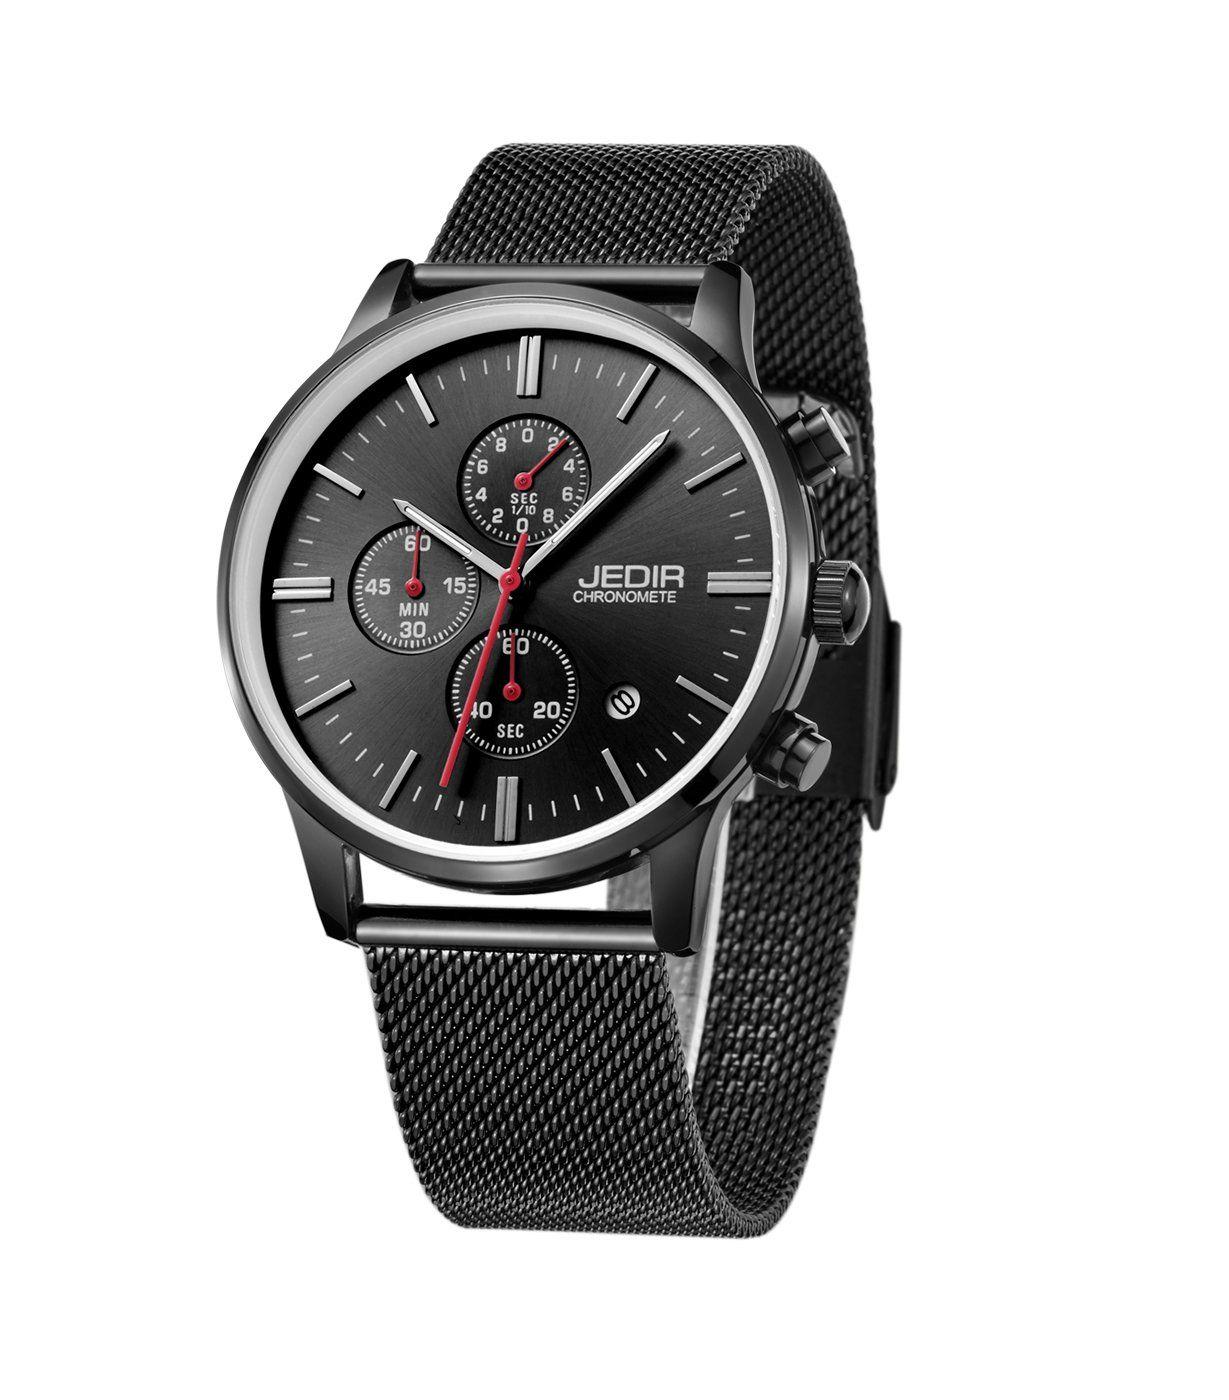 gute jedir milanese strap chronometer quartz wrist watch all black 11mm thin wr30m awesome. Black Bedroom Furniture Sets. Home Design Ideas